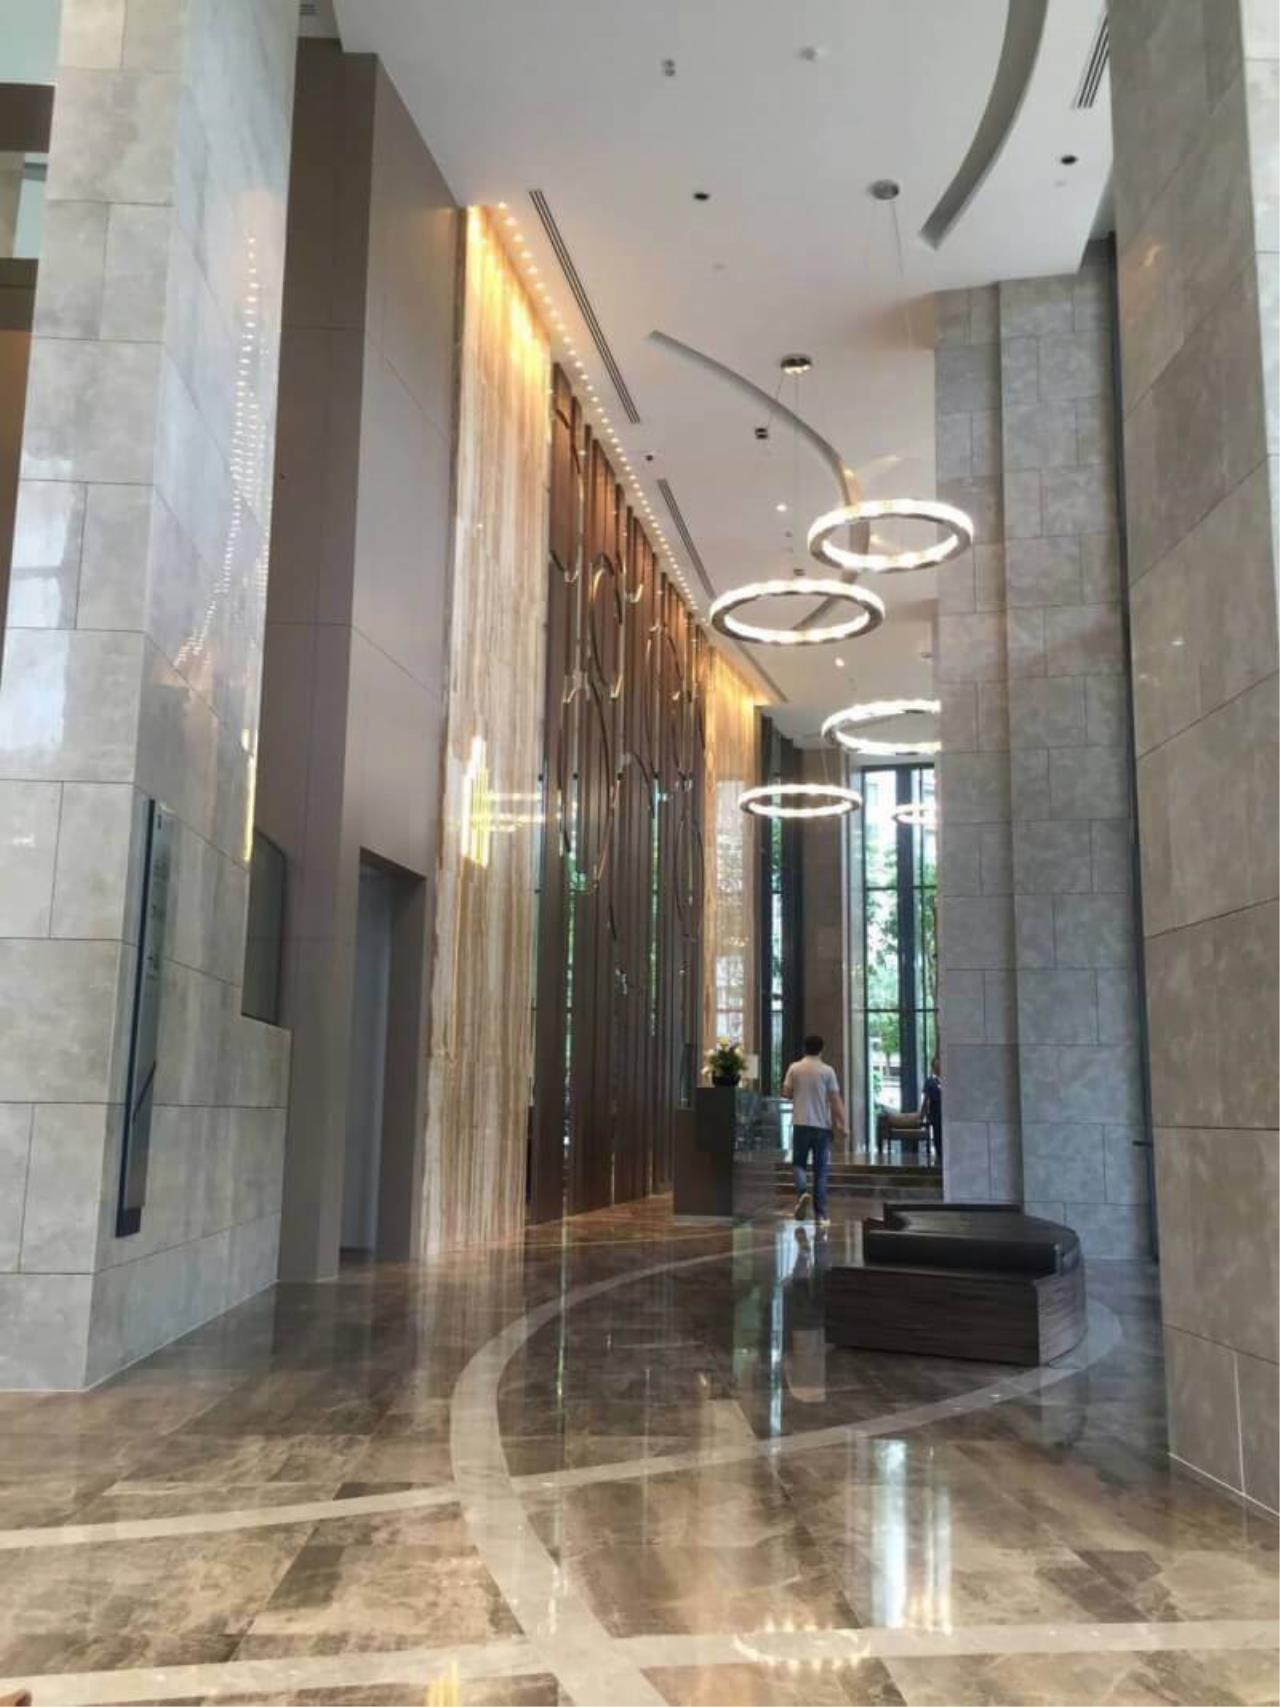 Quality Life Property Agency's S A L E & R E N T !! [ THE LUMPINI 24 ] 1 BR 26.22 Sq.m. Amazing View & Nice Decoration !! 18